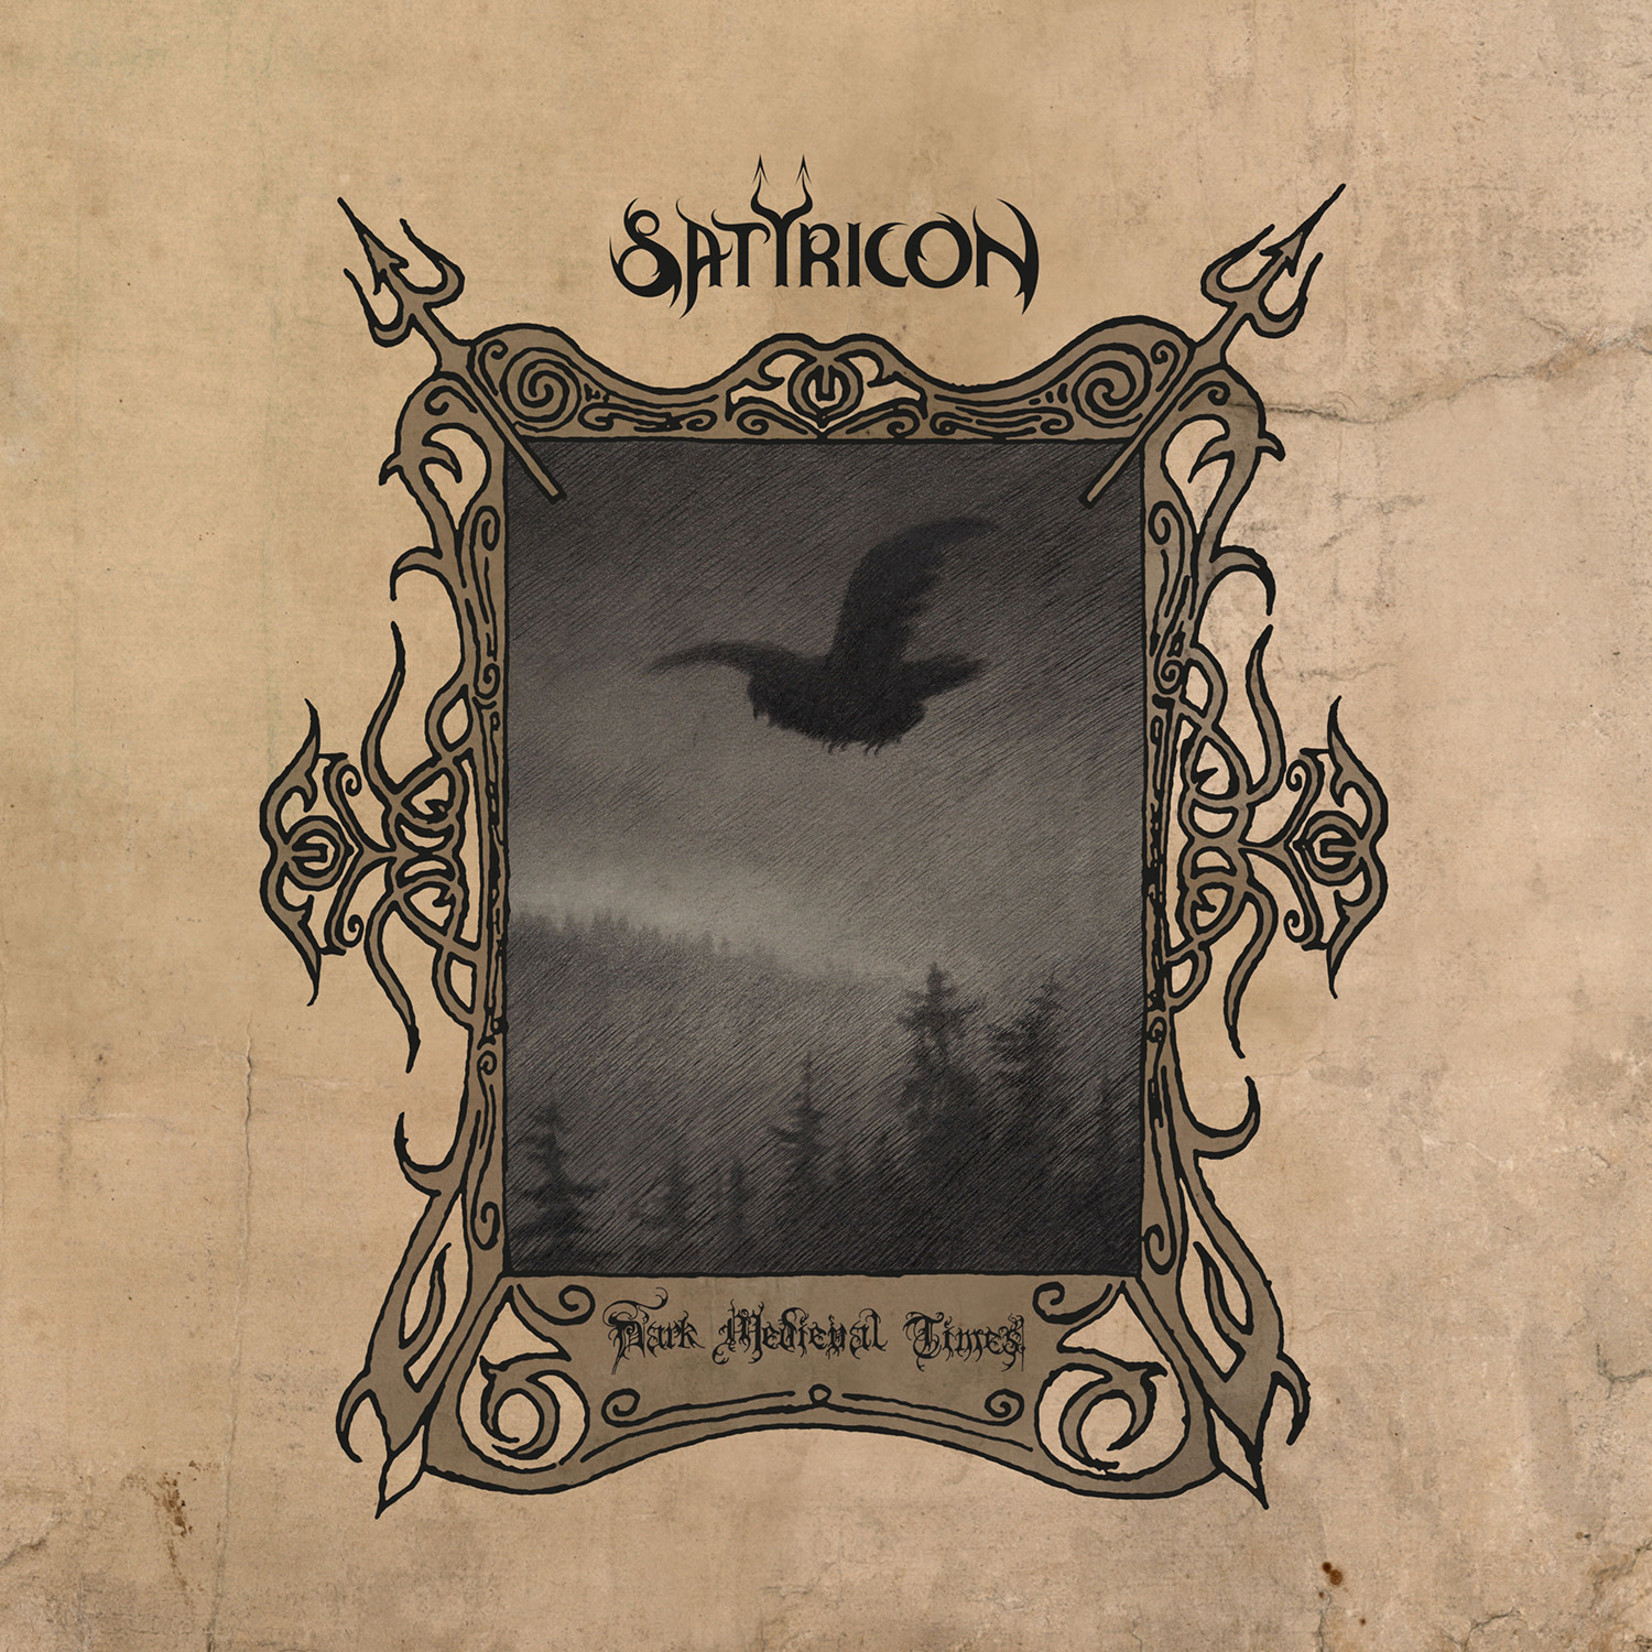 [New] Satyricon: Dark Medieval Times